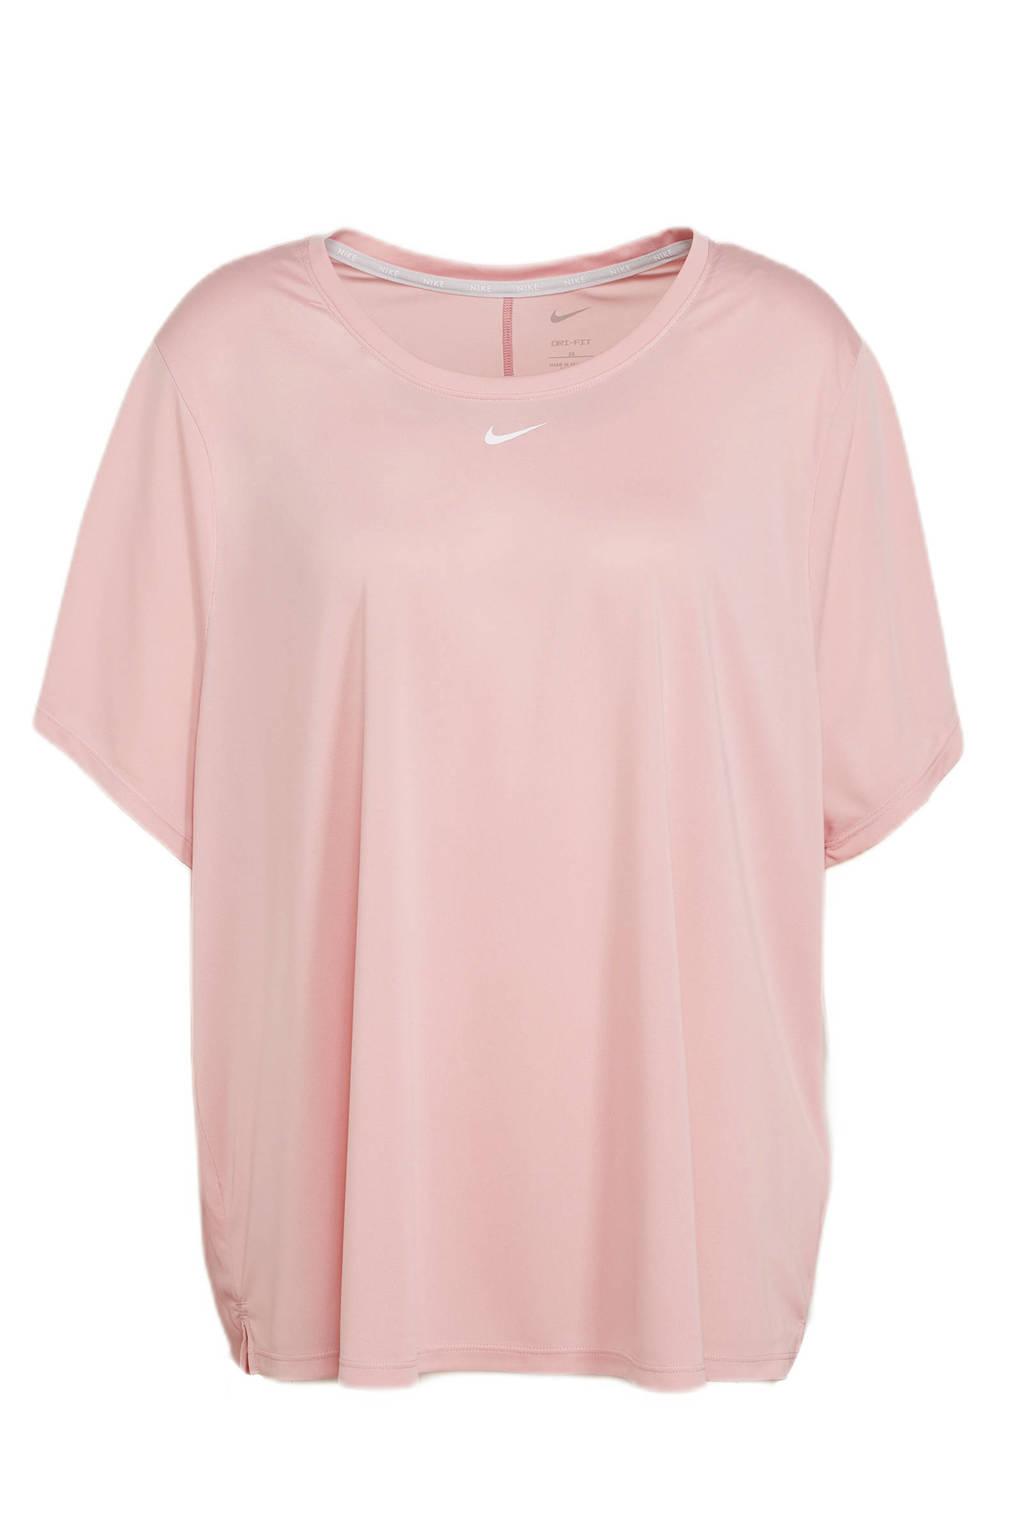 Nike Plus Size sport T-shirt roze, Roze